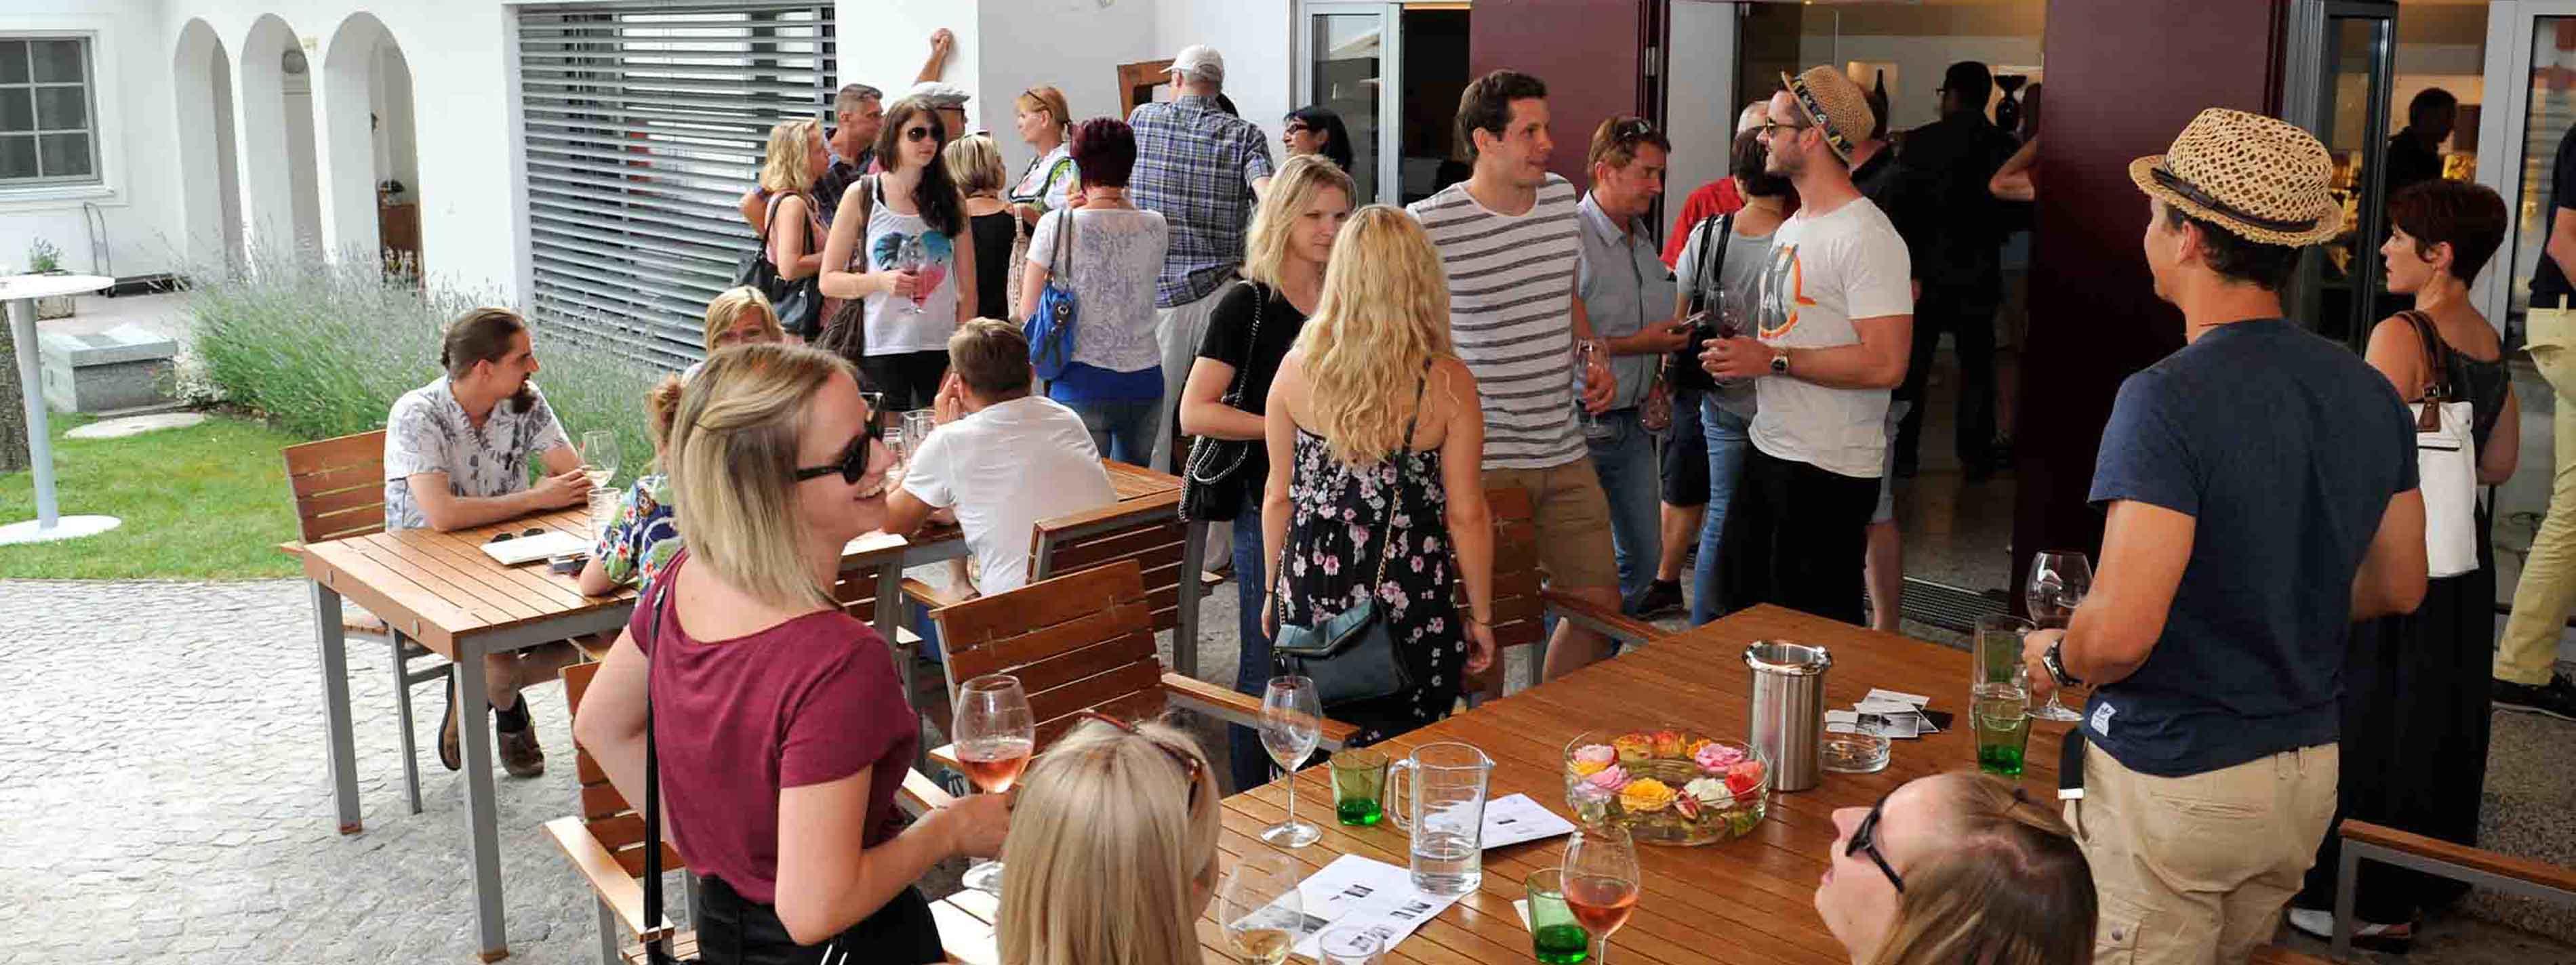 Programm Rotweinfestival DK 2019